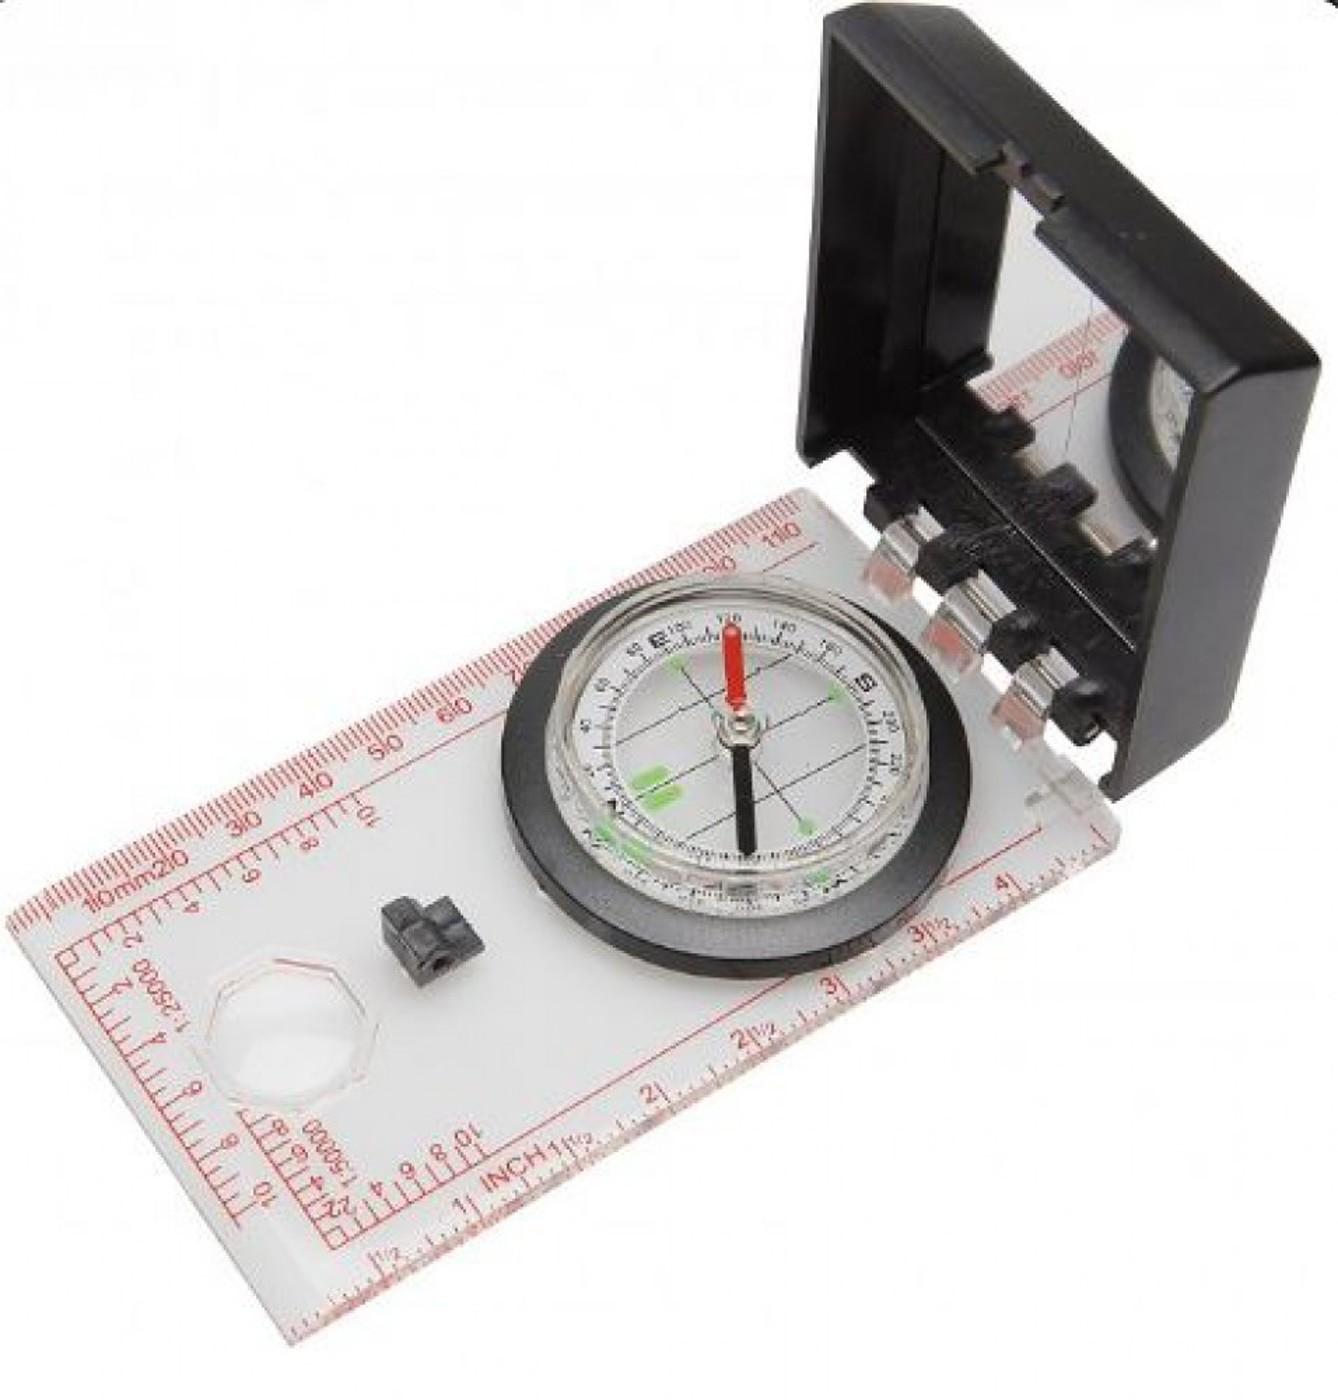 HIGH COLORADO Compass